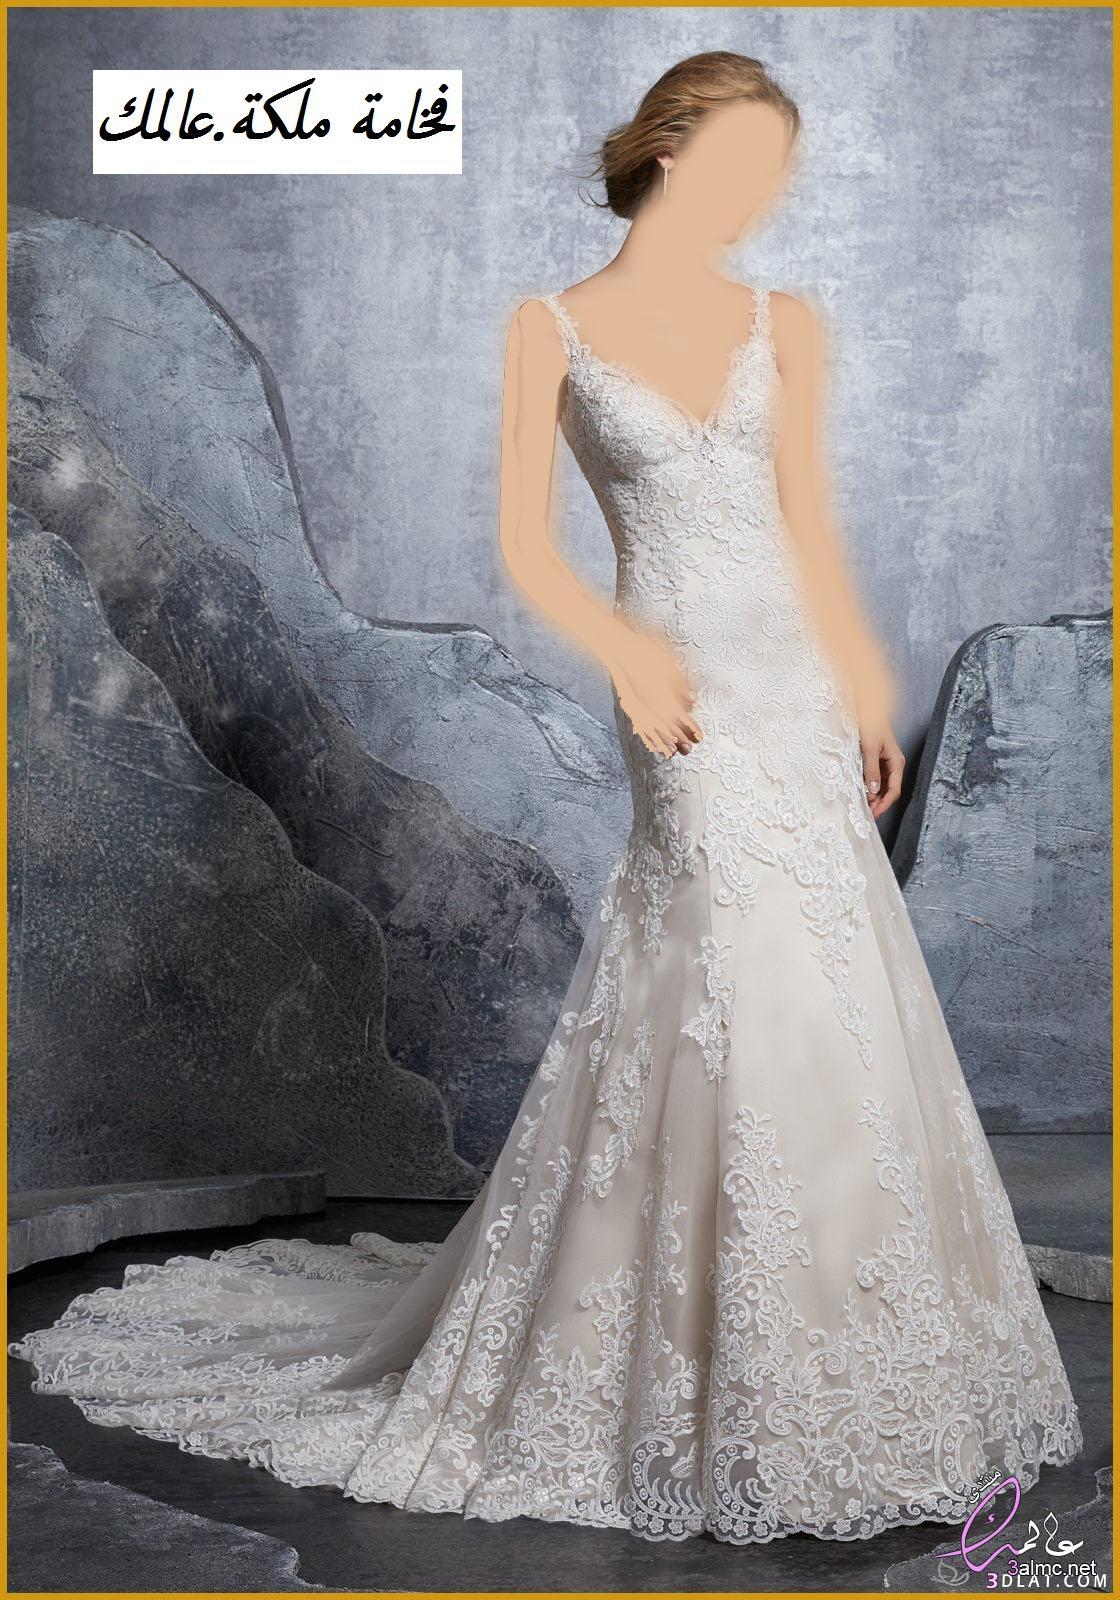 فساتين زفاف فخمة 2018,فساتين اعراس ناعمة,فساتين فرح سمبل2018,فساتين زفاف جميلة,فساتين زفاف تركى,